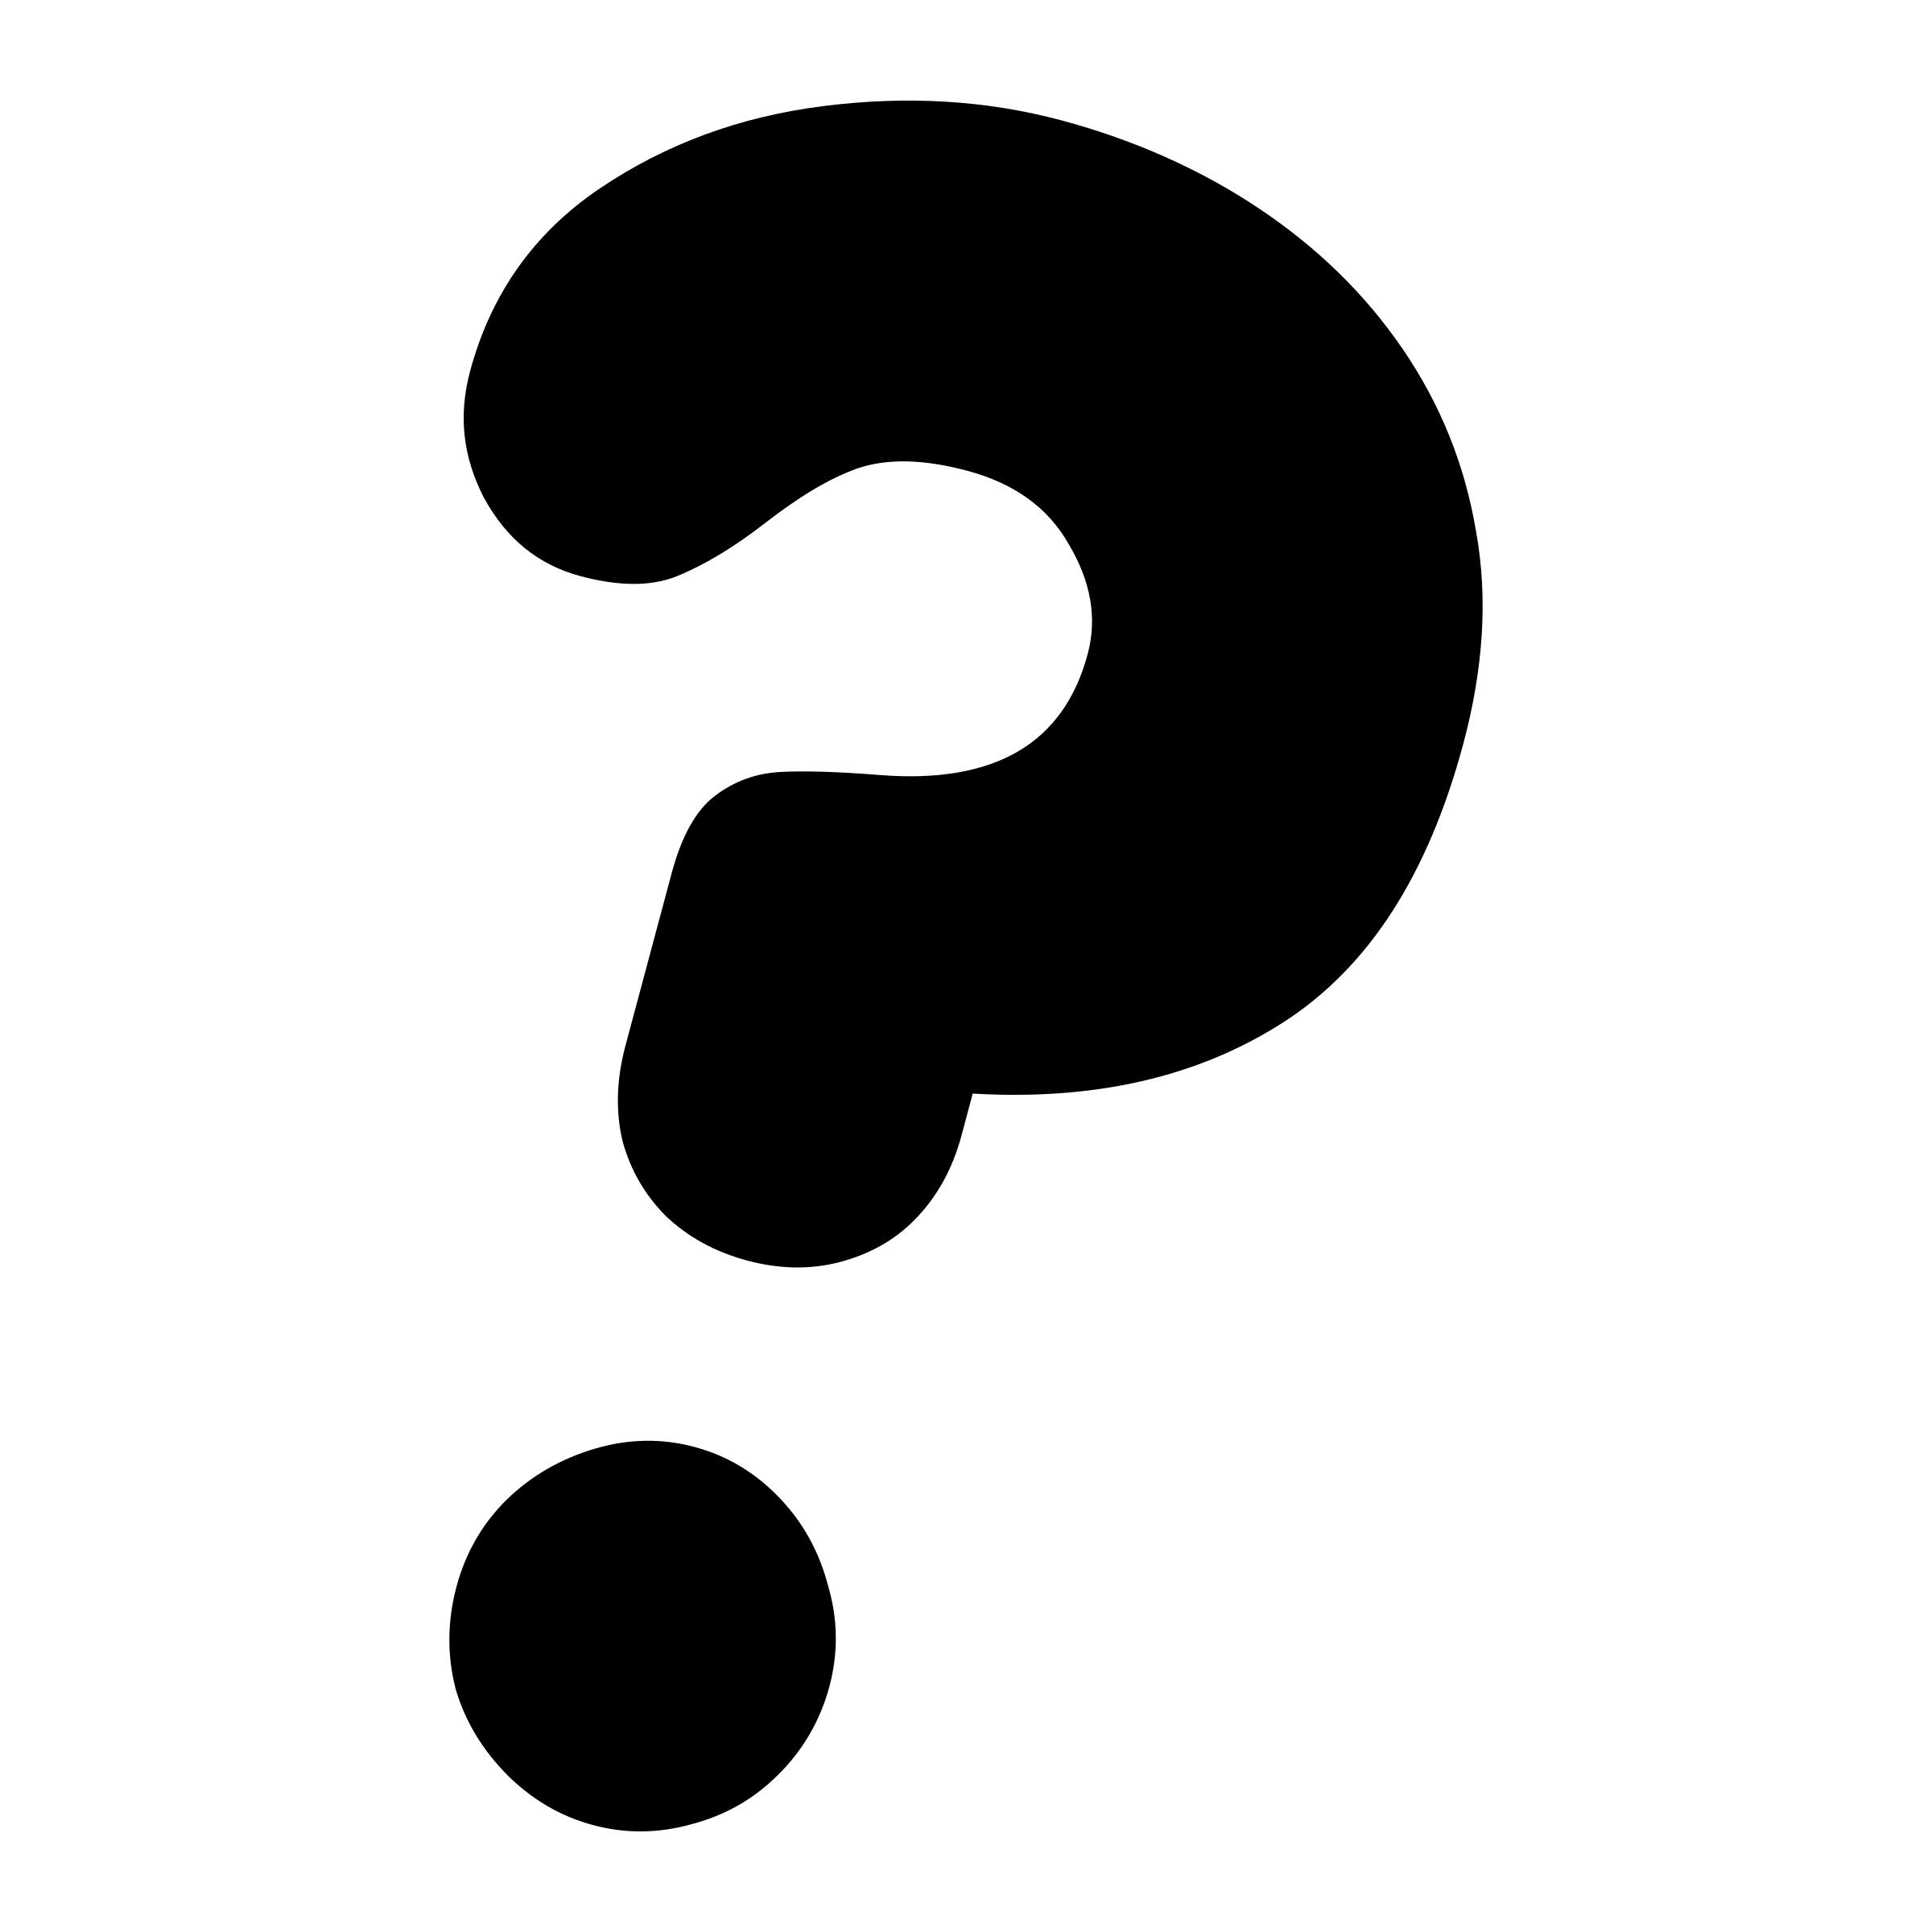 Questions question mark clip art free clipart images 3 ...